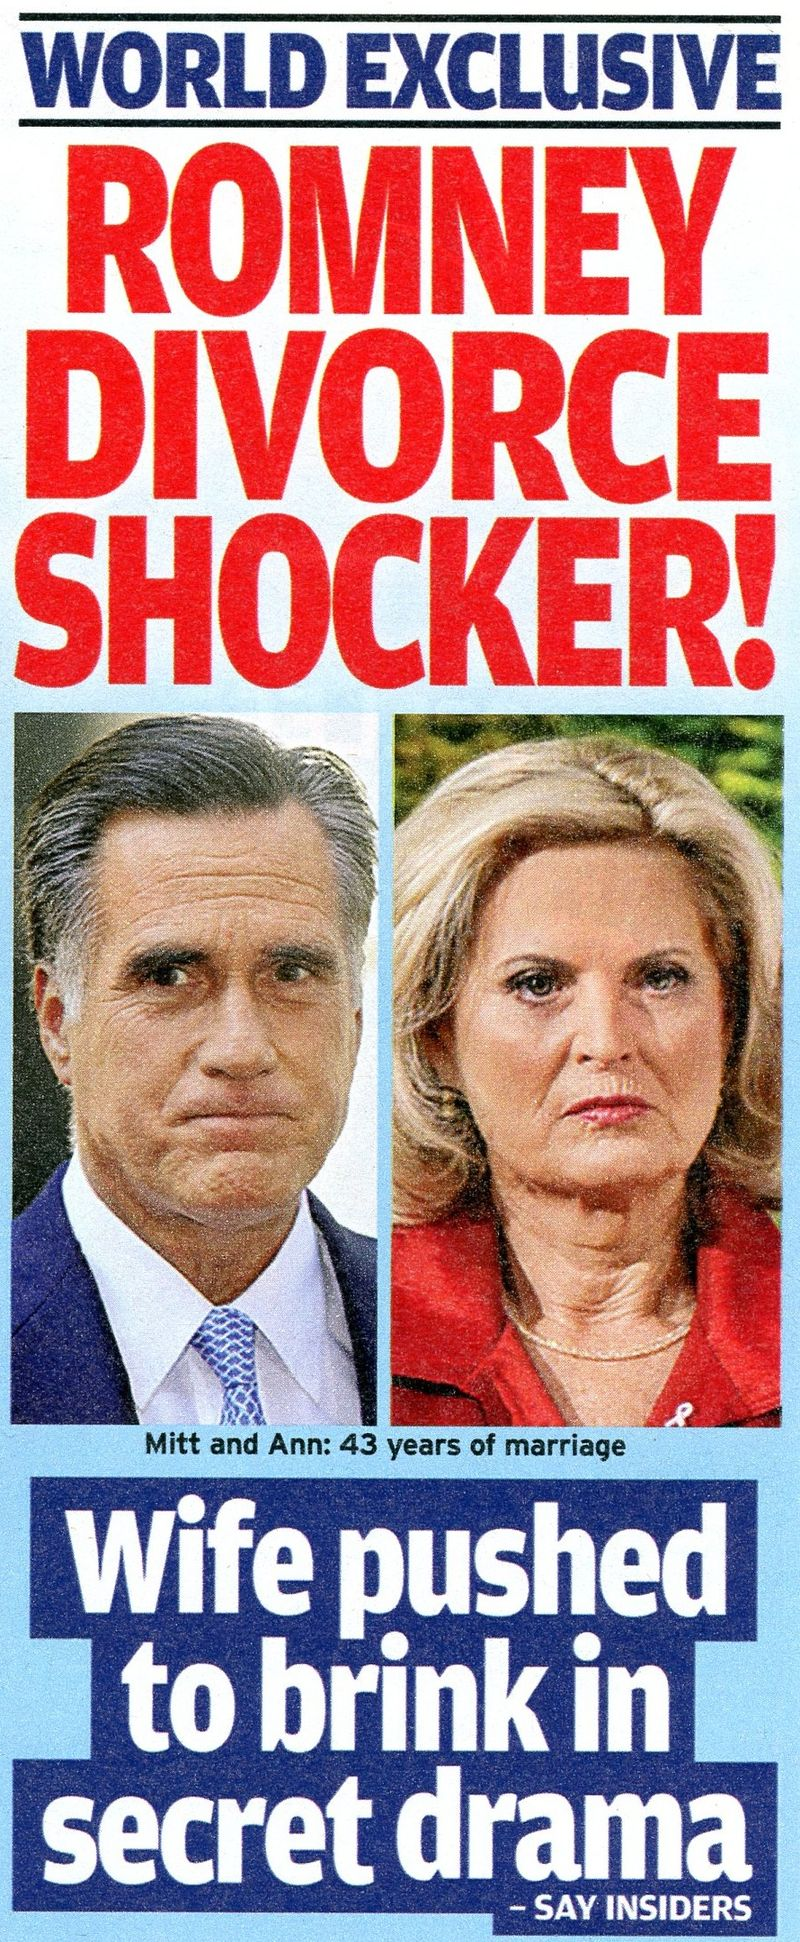 47-Ann-Mitt-Romney-divorce